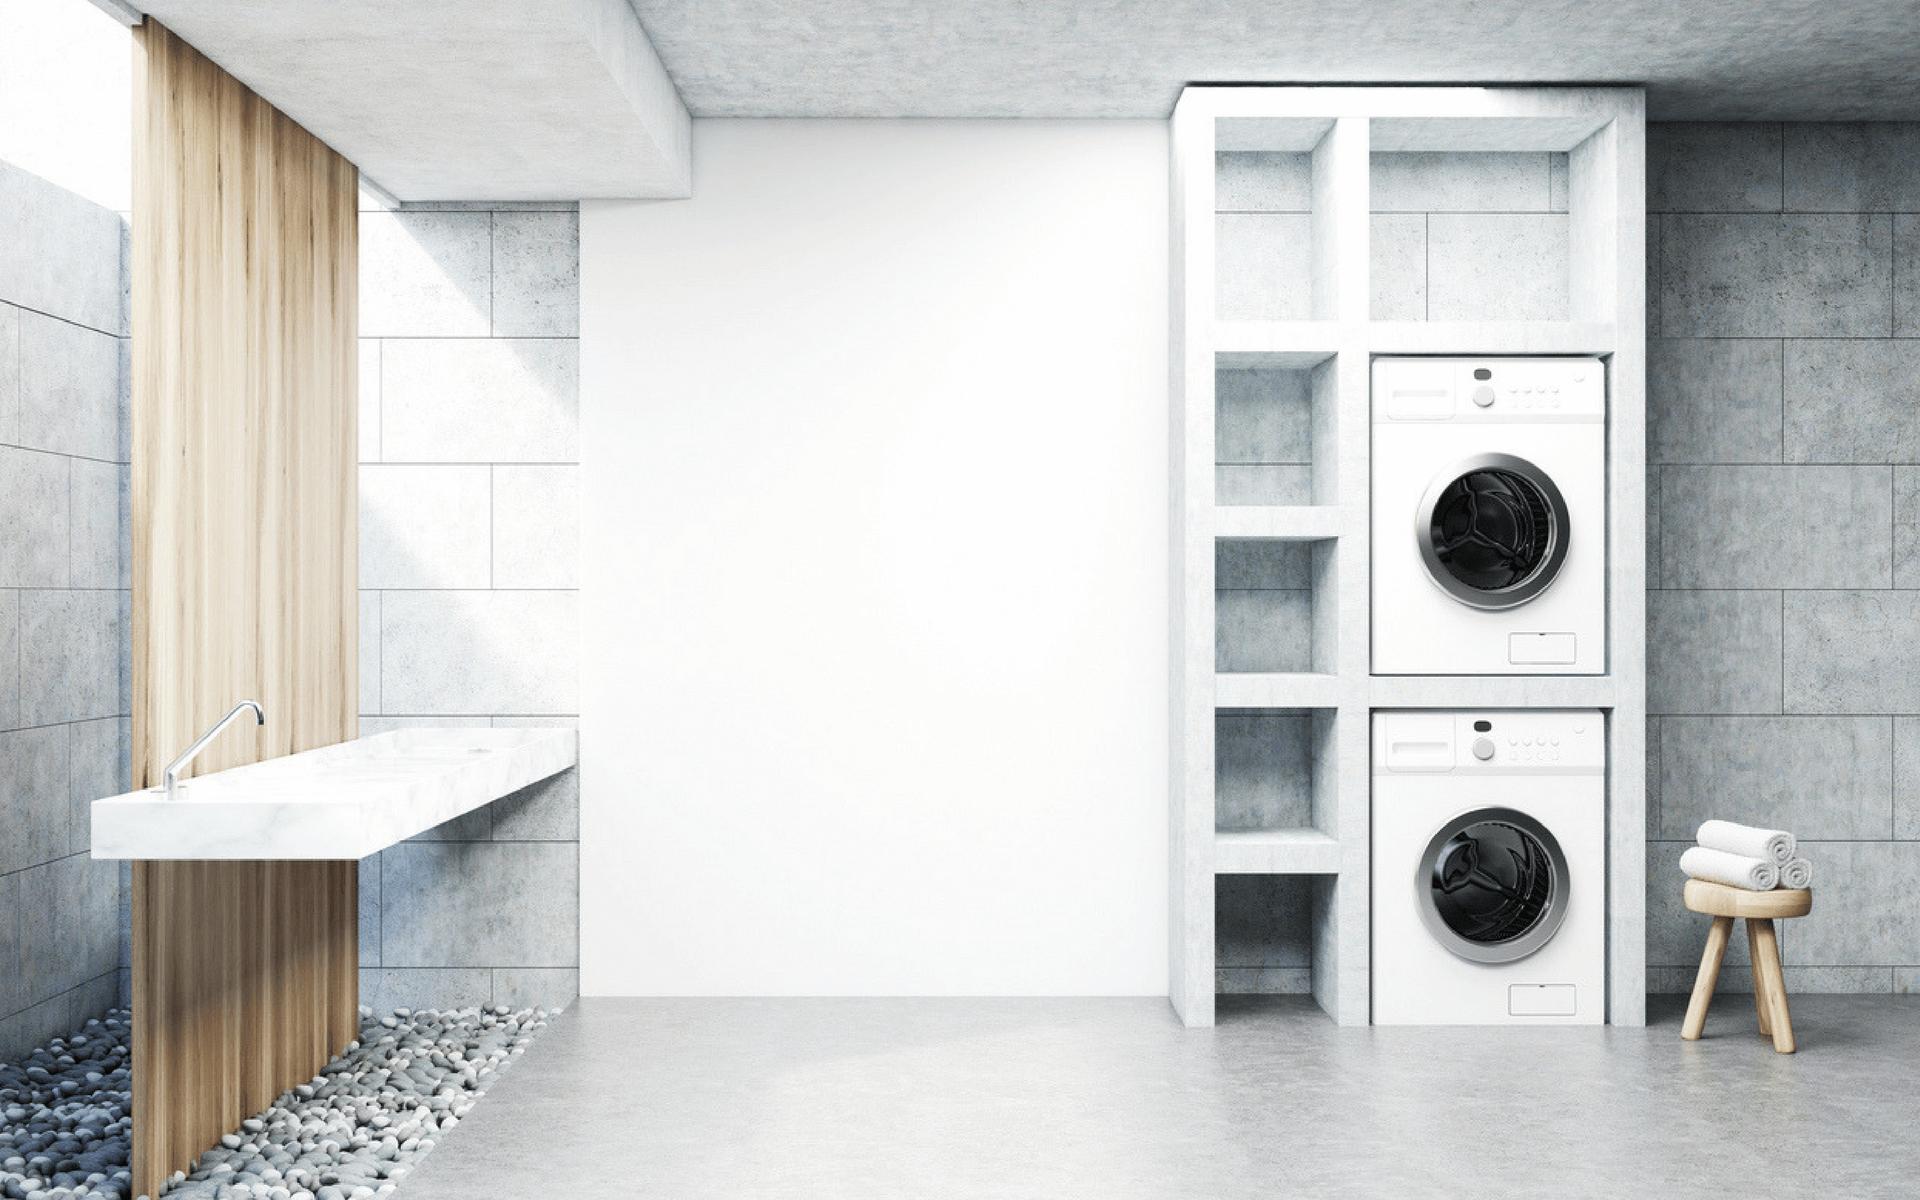 Come arredare una lavanderia in casa blog oknoplast - Lavanderia in casa ...